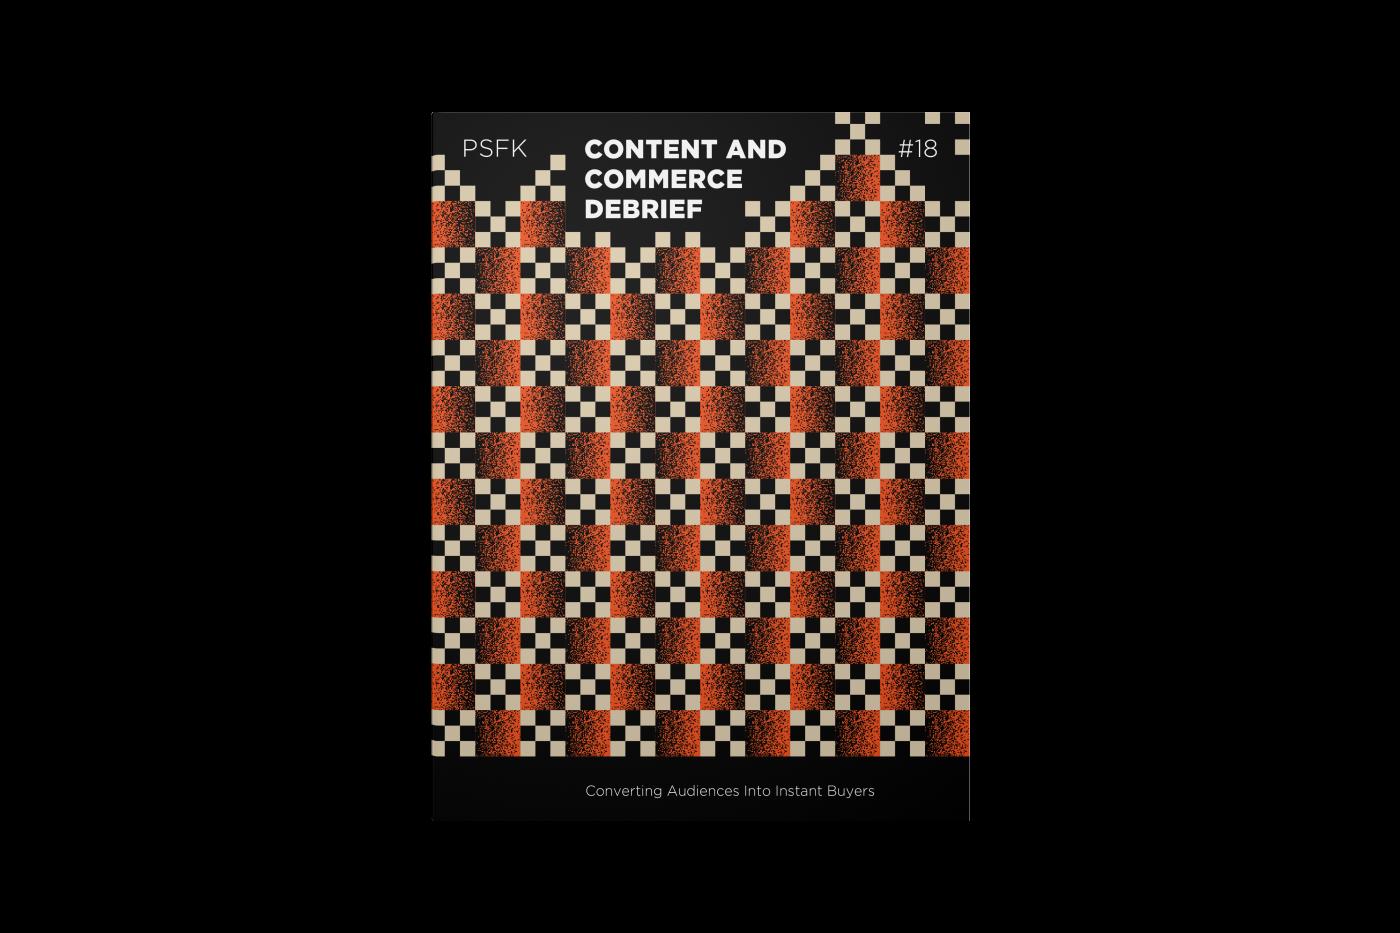 Content & Commerce Debrief